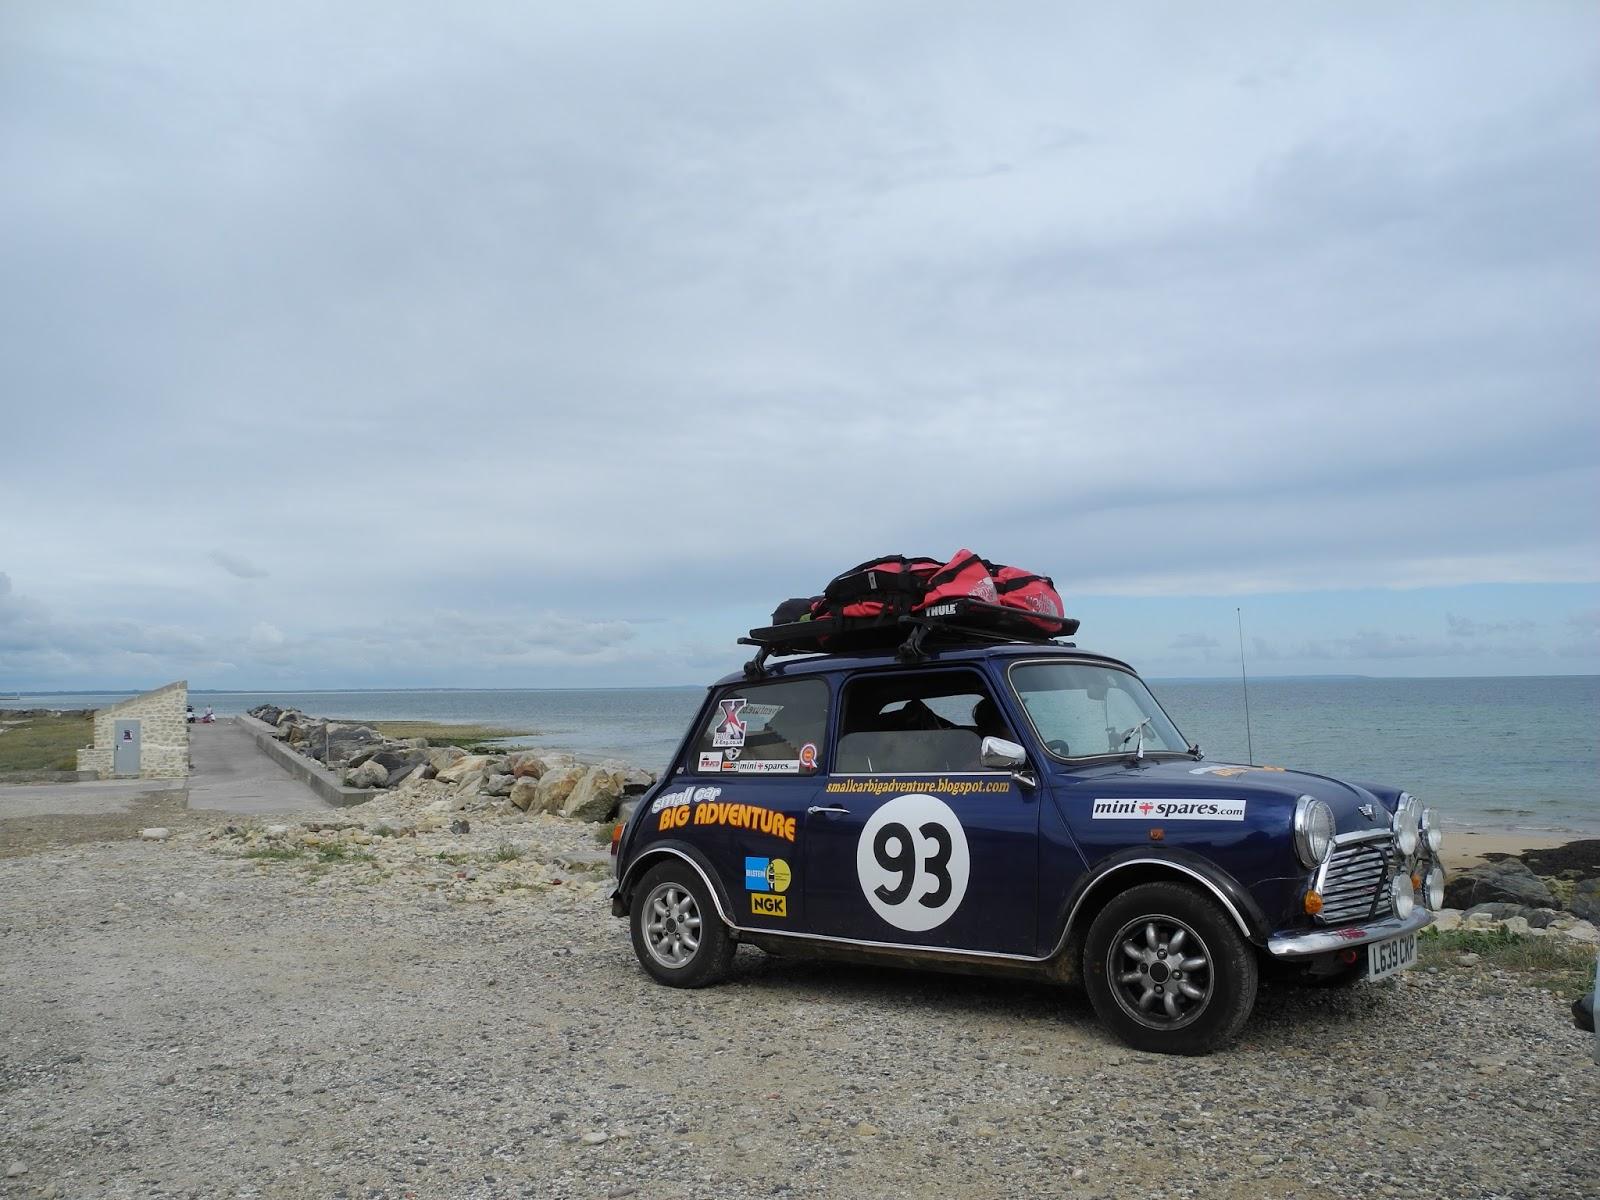 Adventure Car: Small Car, Big Adventure!: The Car